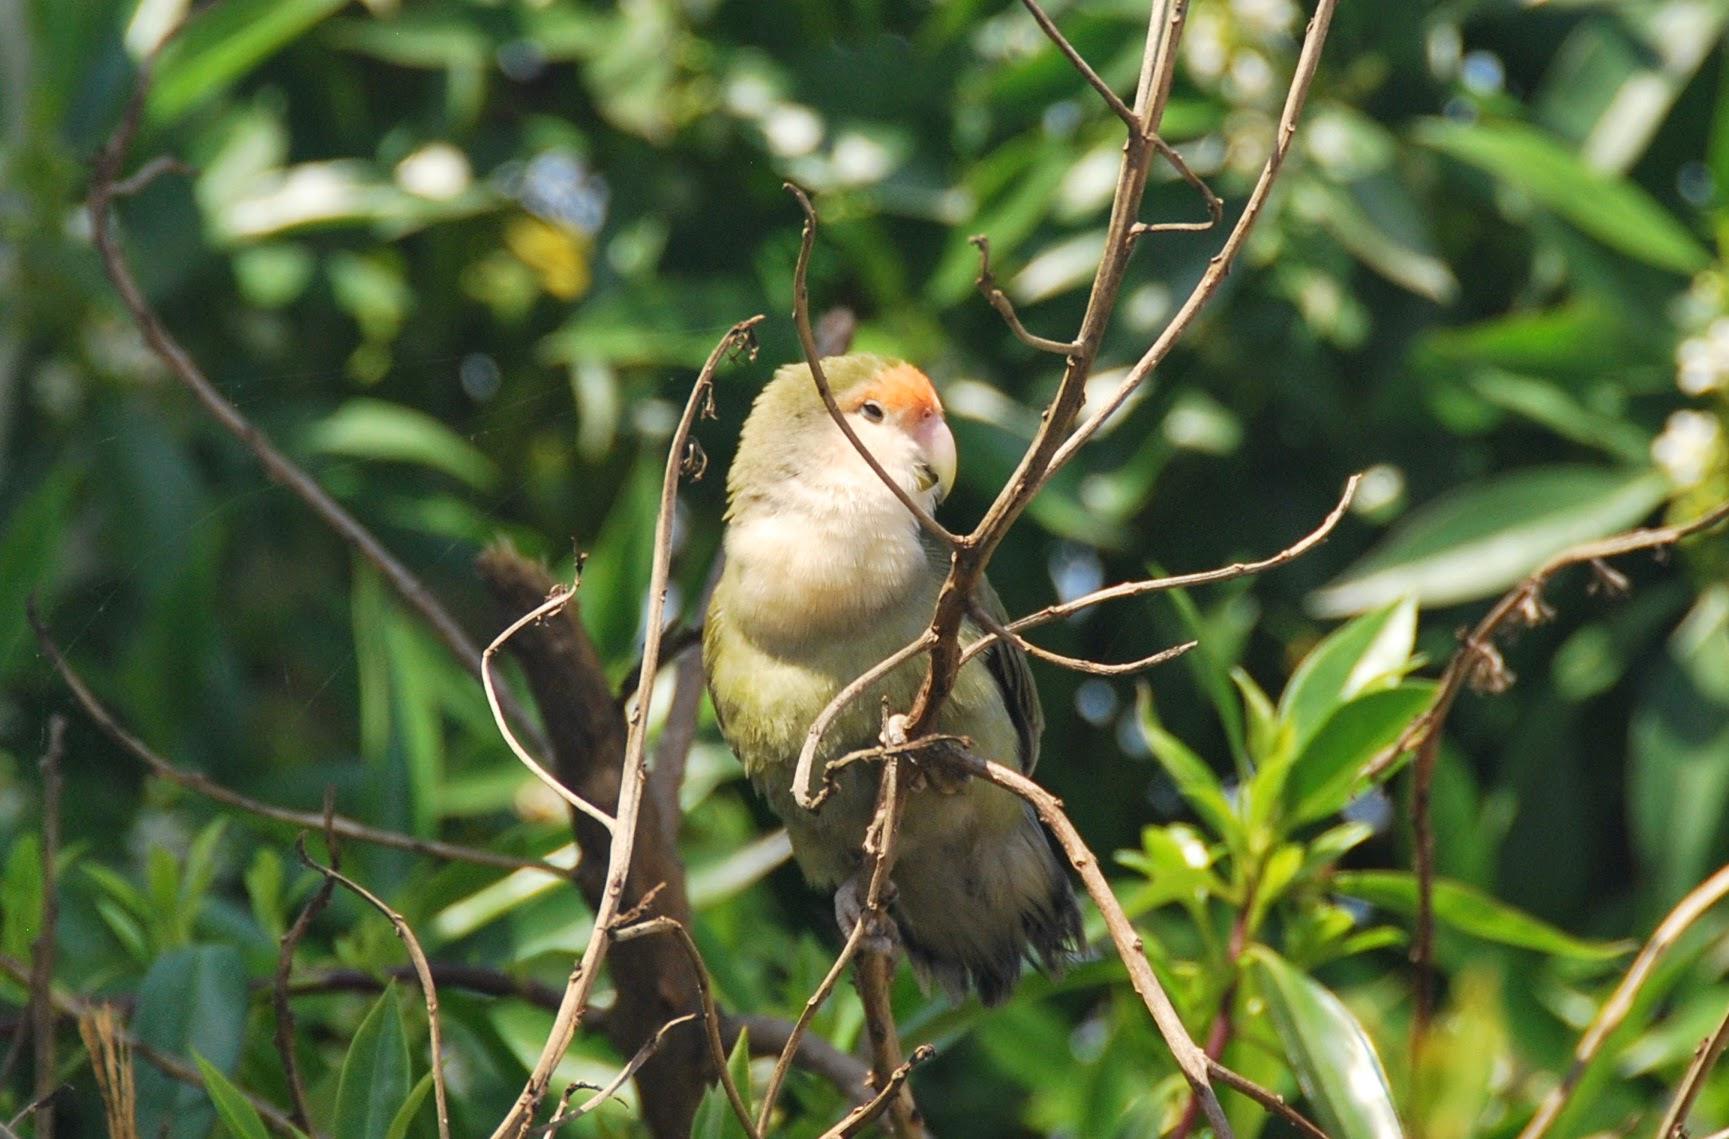 Rosy-faced Lovebird (Agapornis roseicollis – Inséparable rosegorge), Mohammedia, 7 April 2015 (Ines Beert)